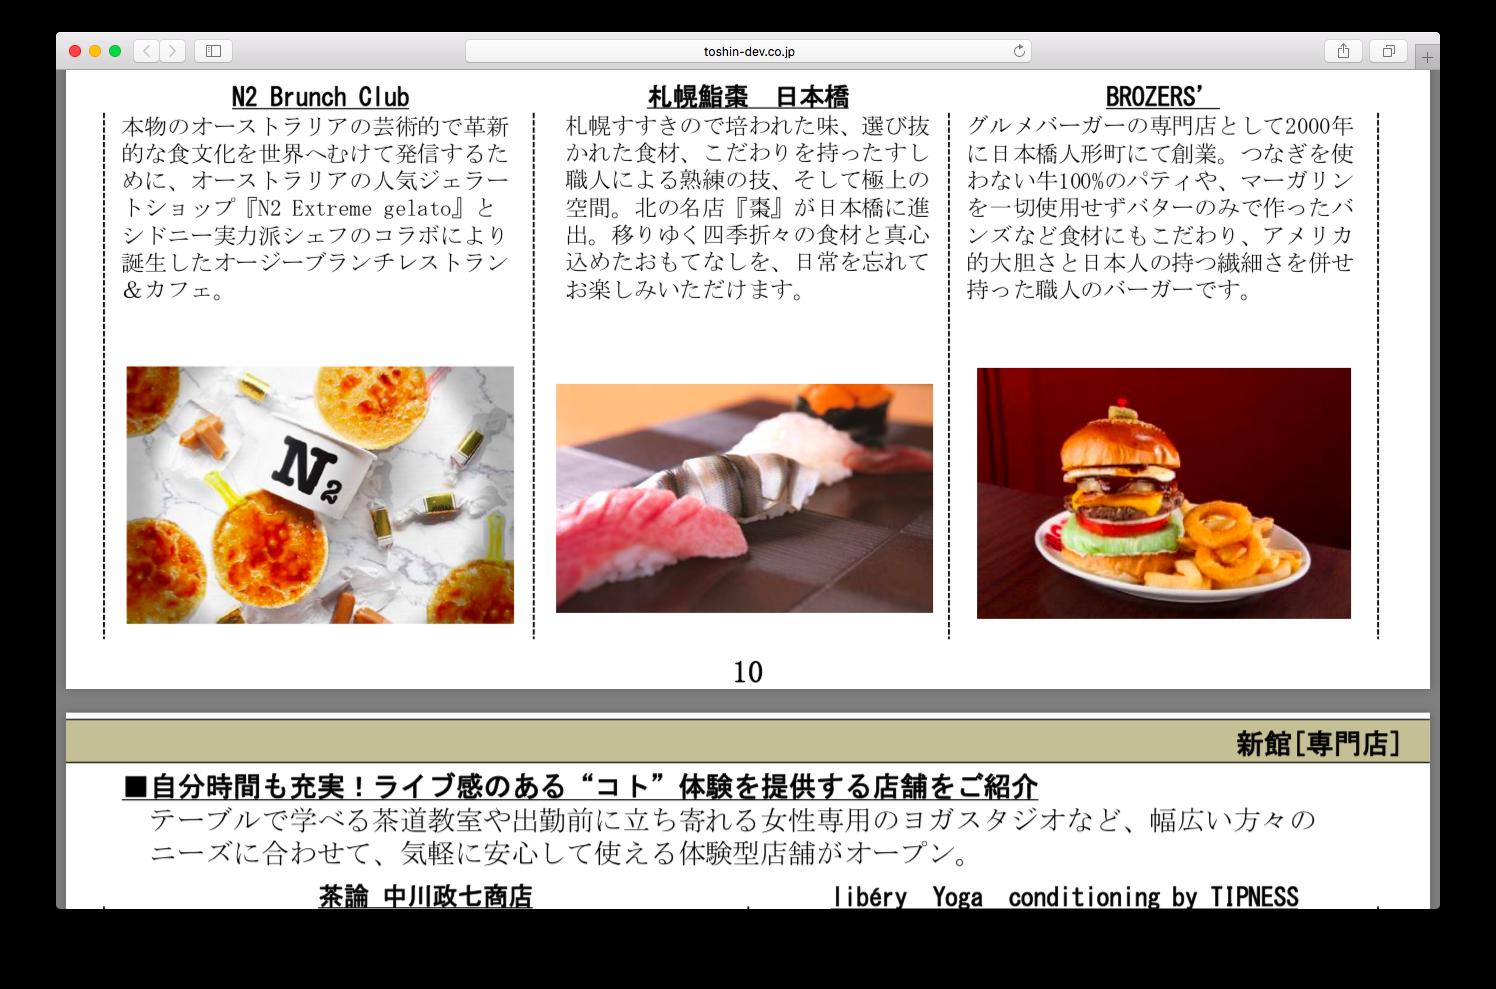 Toshin Development